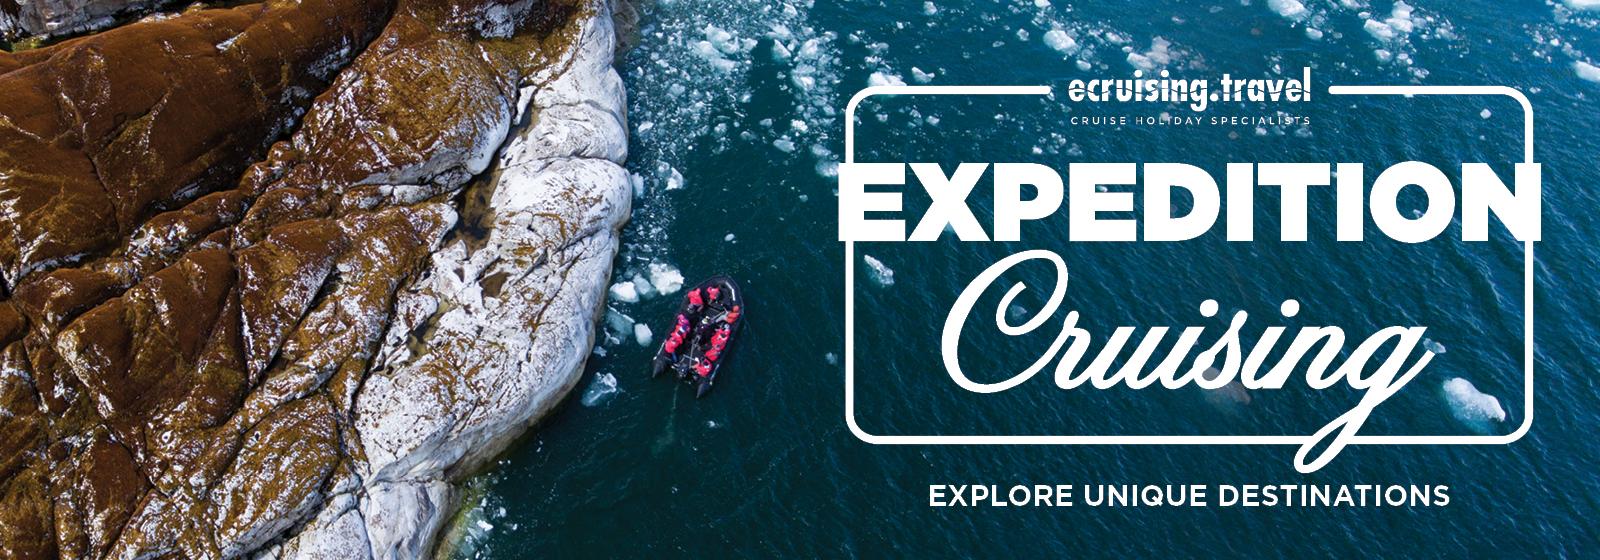 expedition-cruising